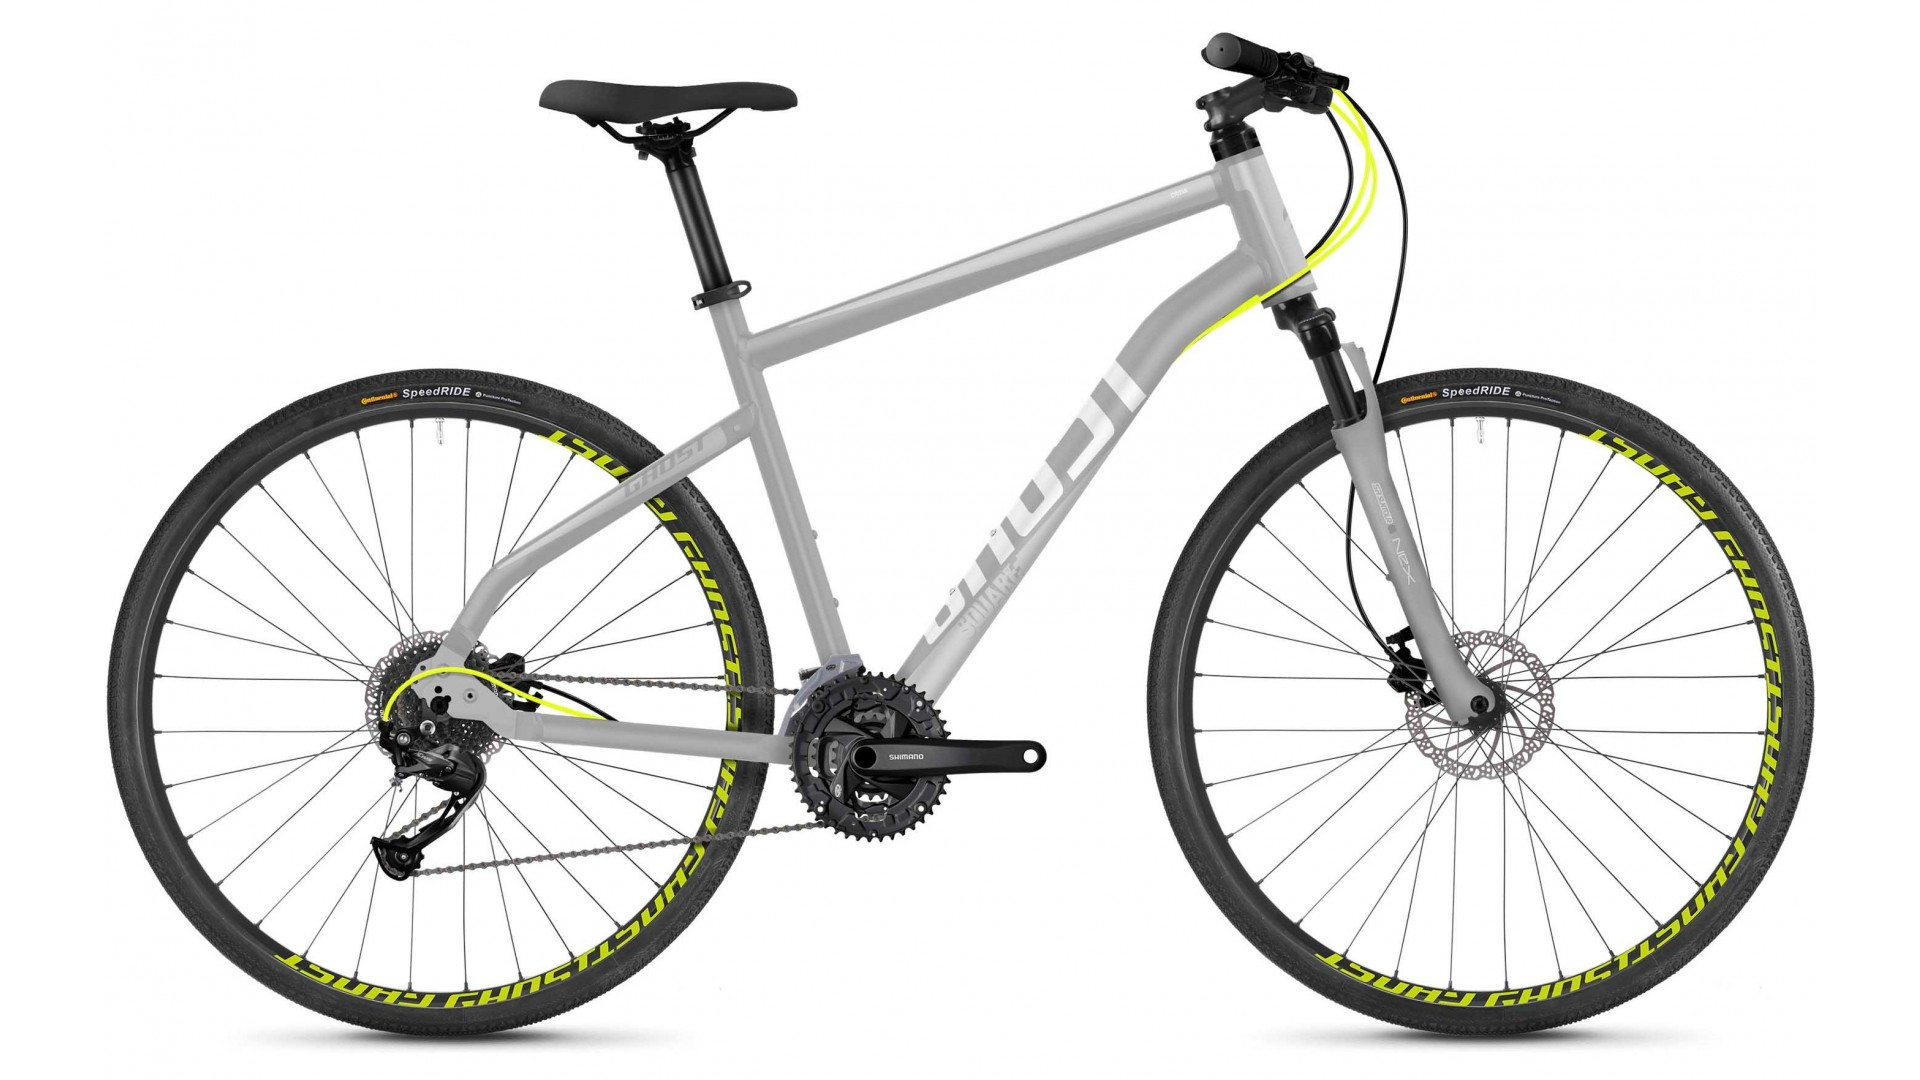 Велосипед GHOST Square Cross 1.8 AL U palladium silver / iridium silver / neon yellow год 2018